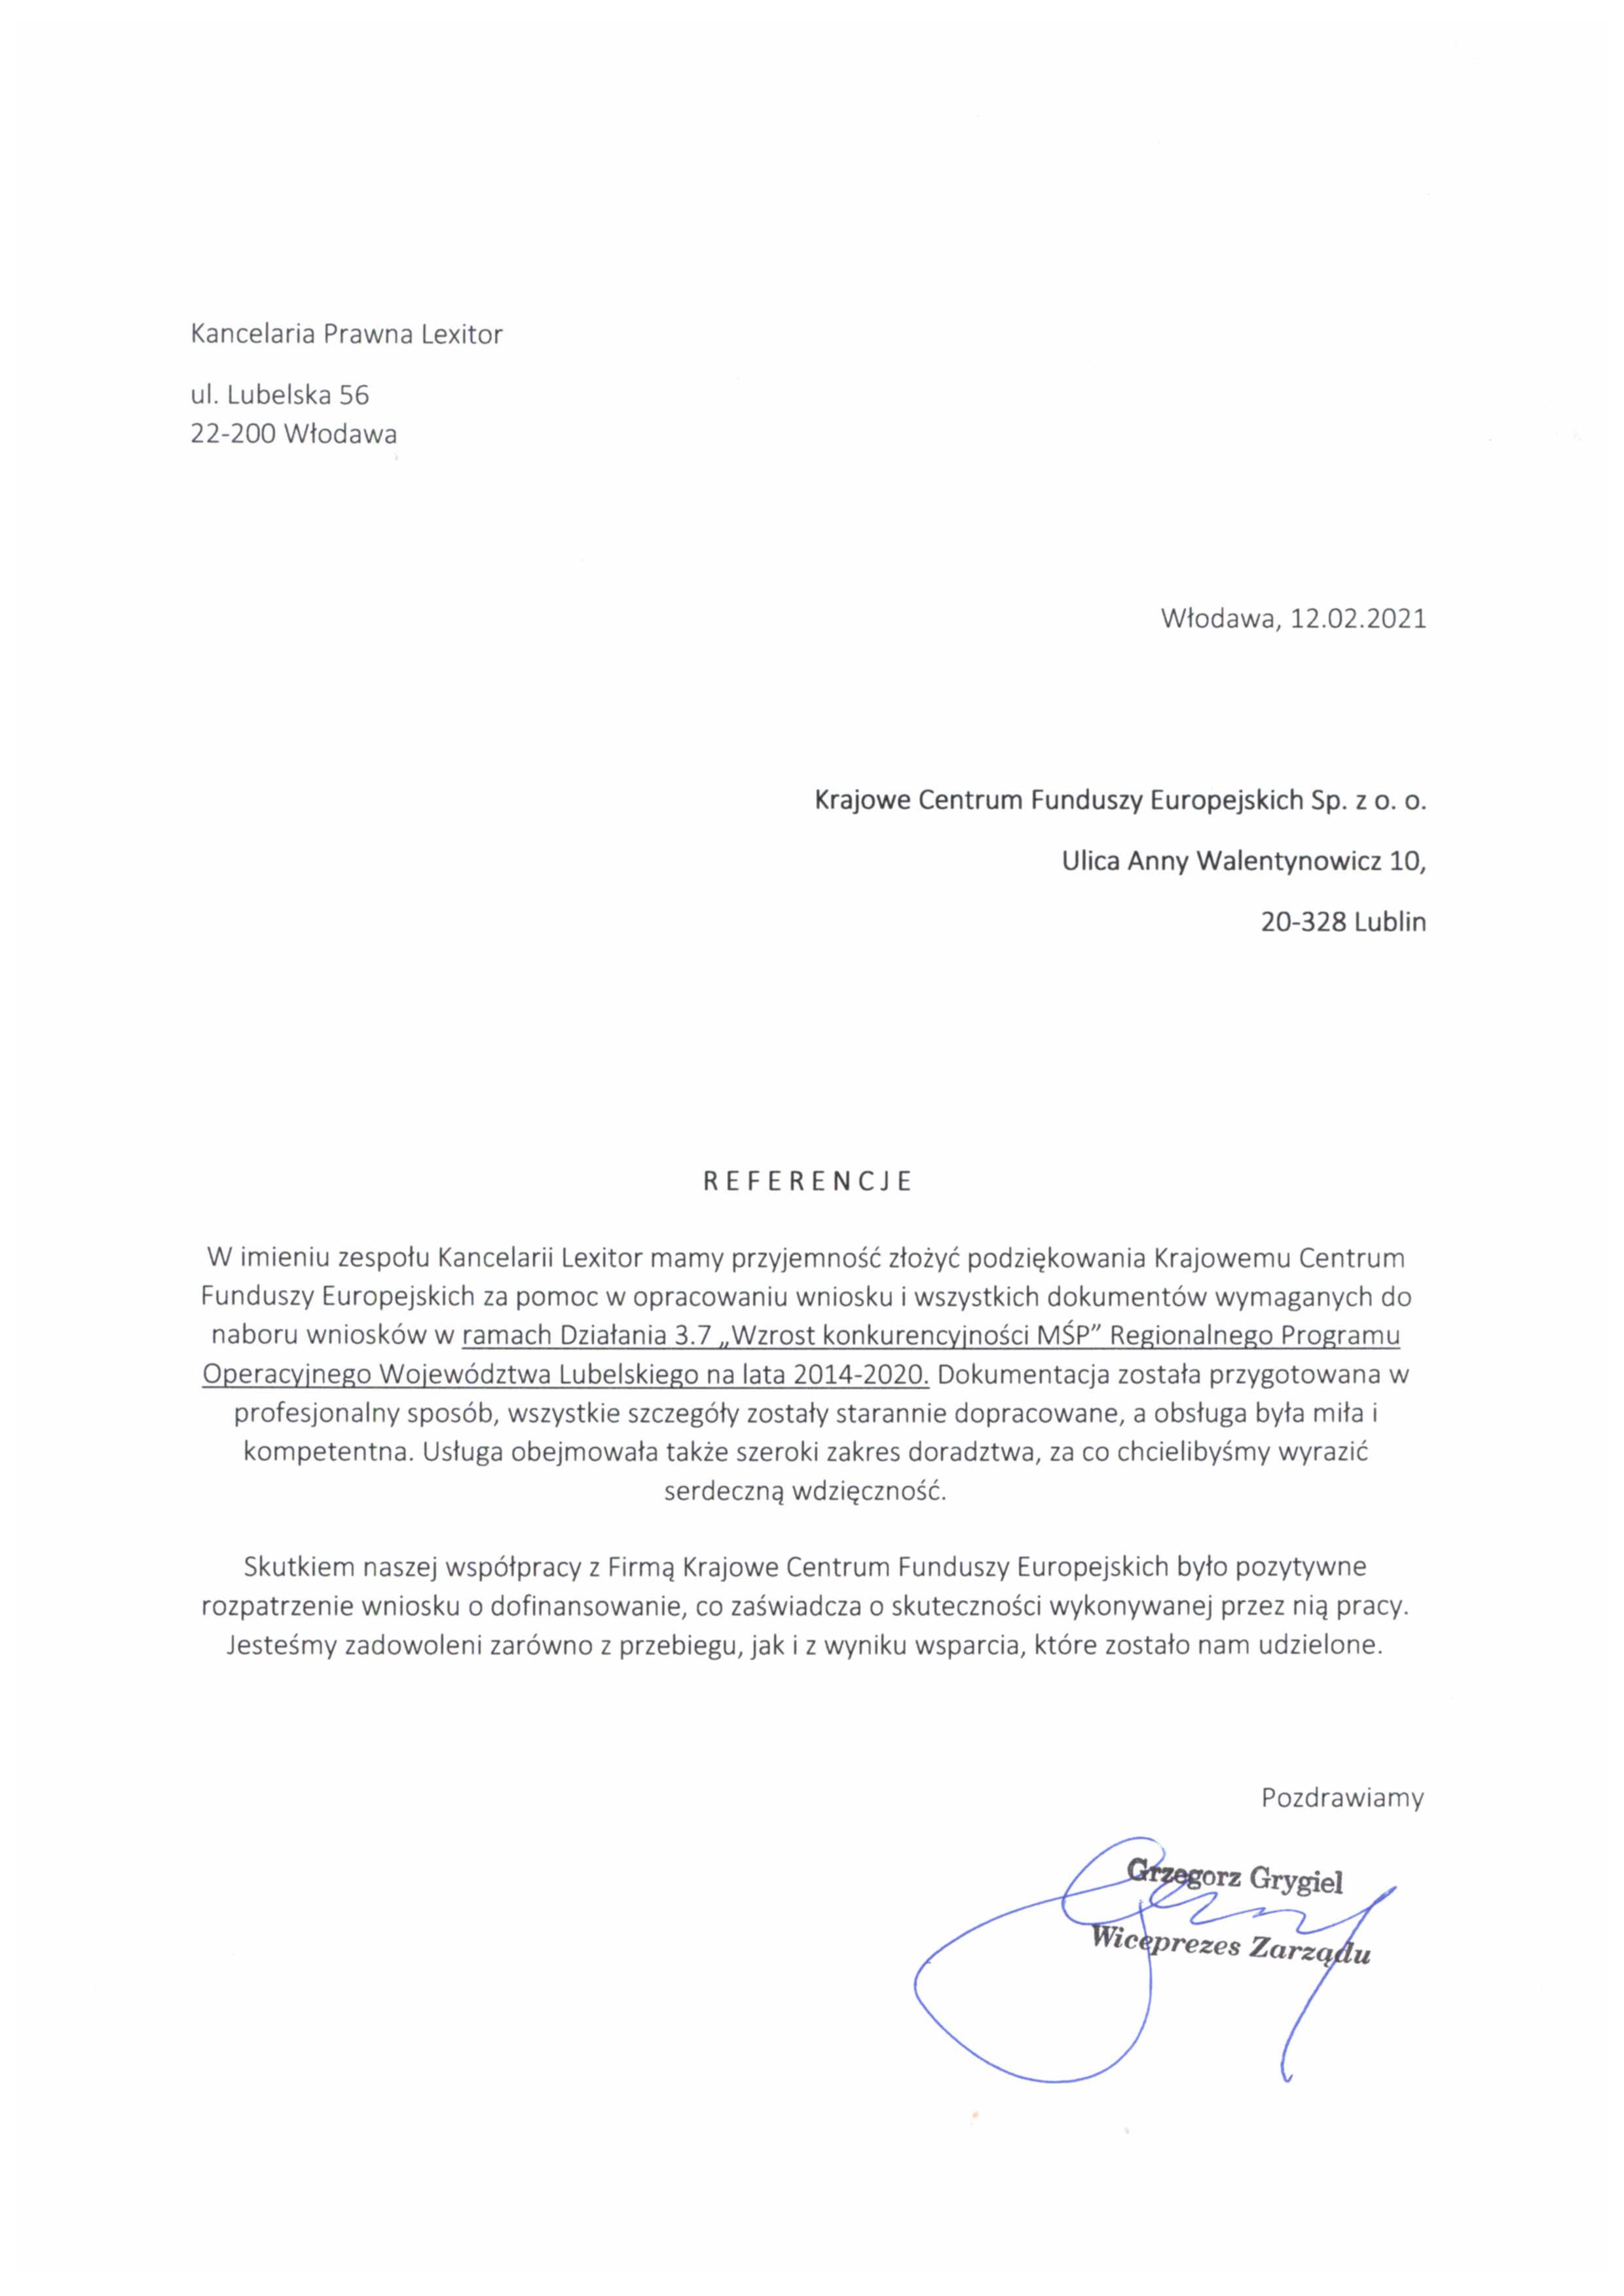 Referencje Lexitor (druga wersja) 12.02.2021 - JPG